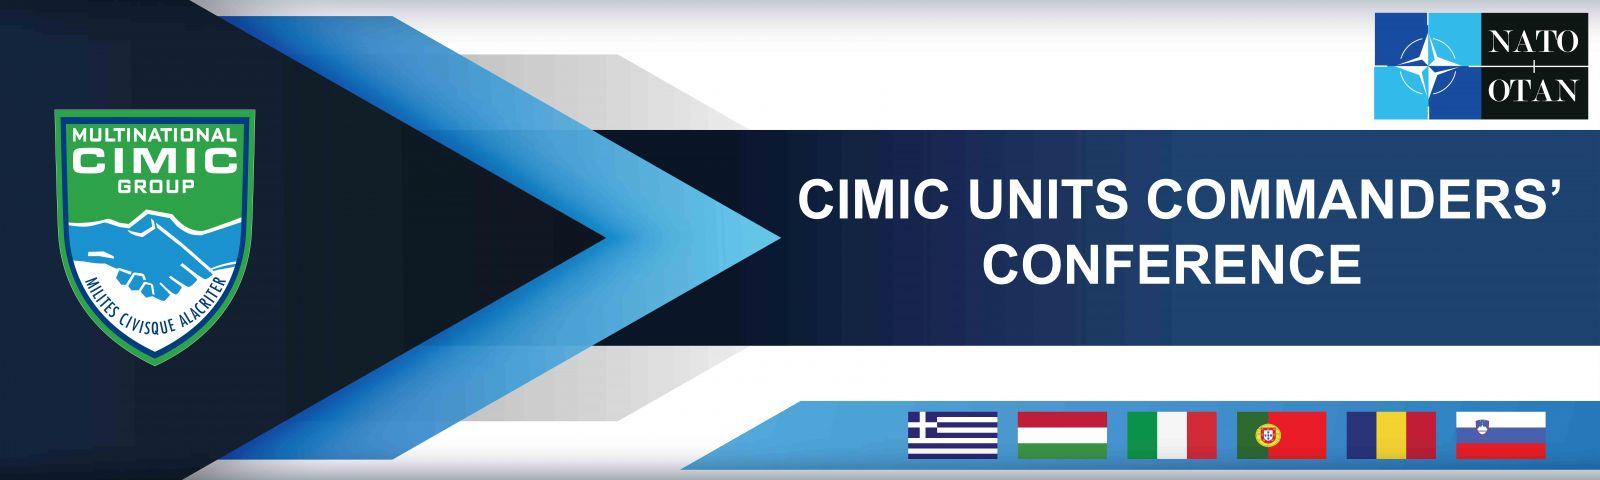 Cimic units commanders conference